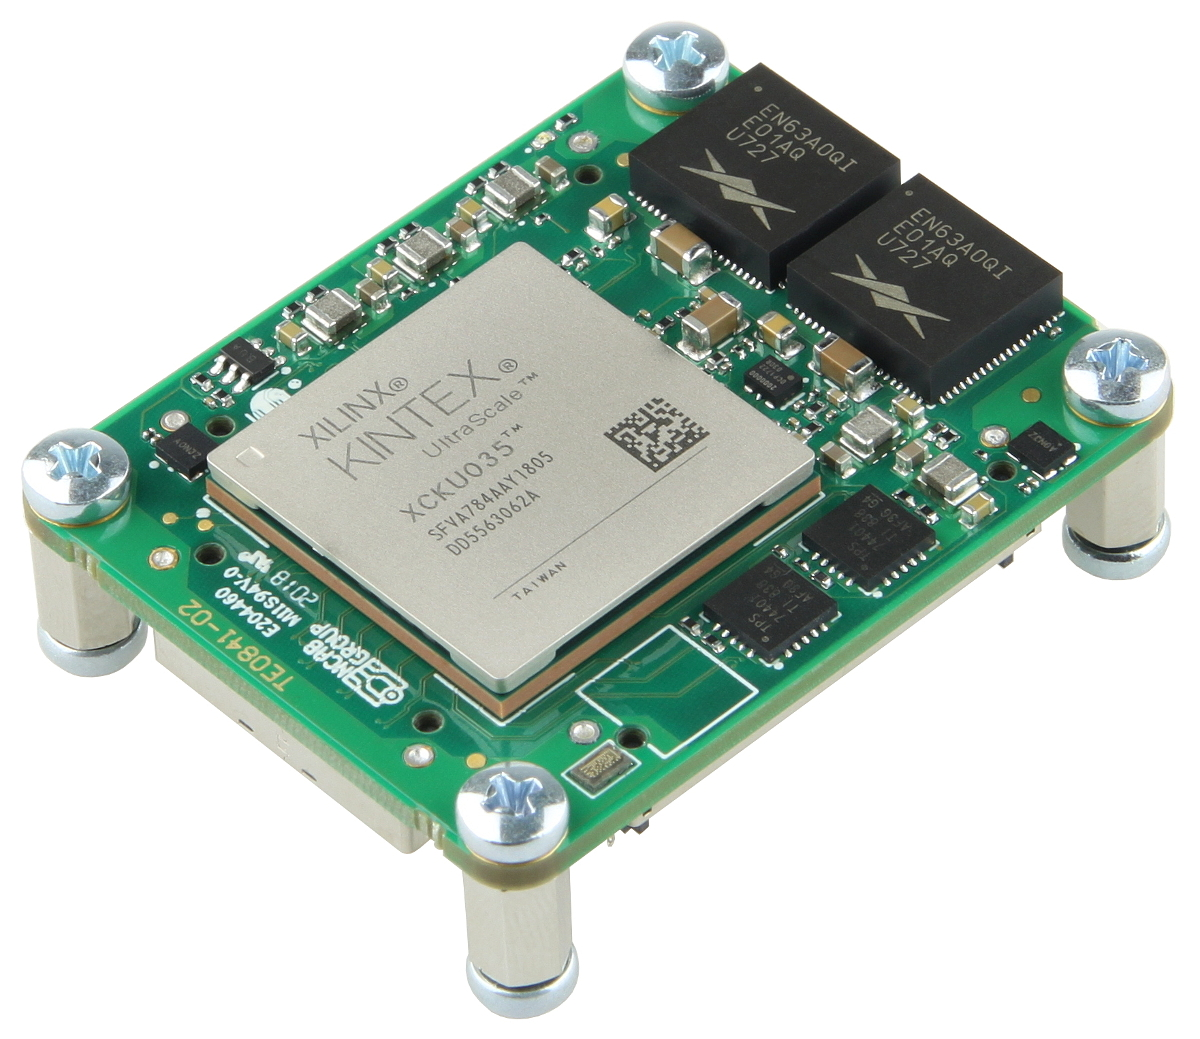 Mikromodule with Xilinx Kintex UltraScale KU035, 2 GByte